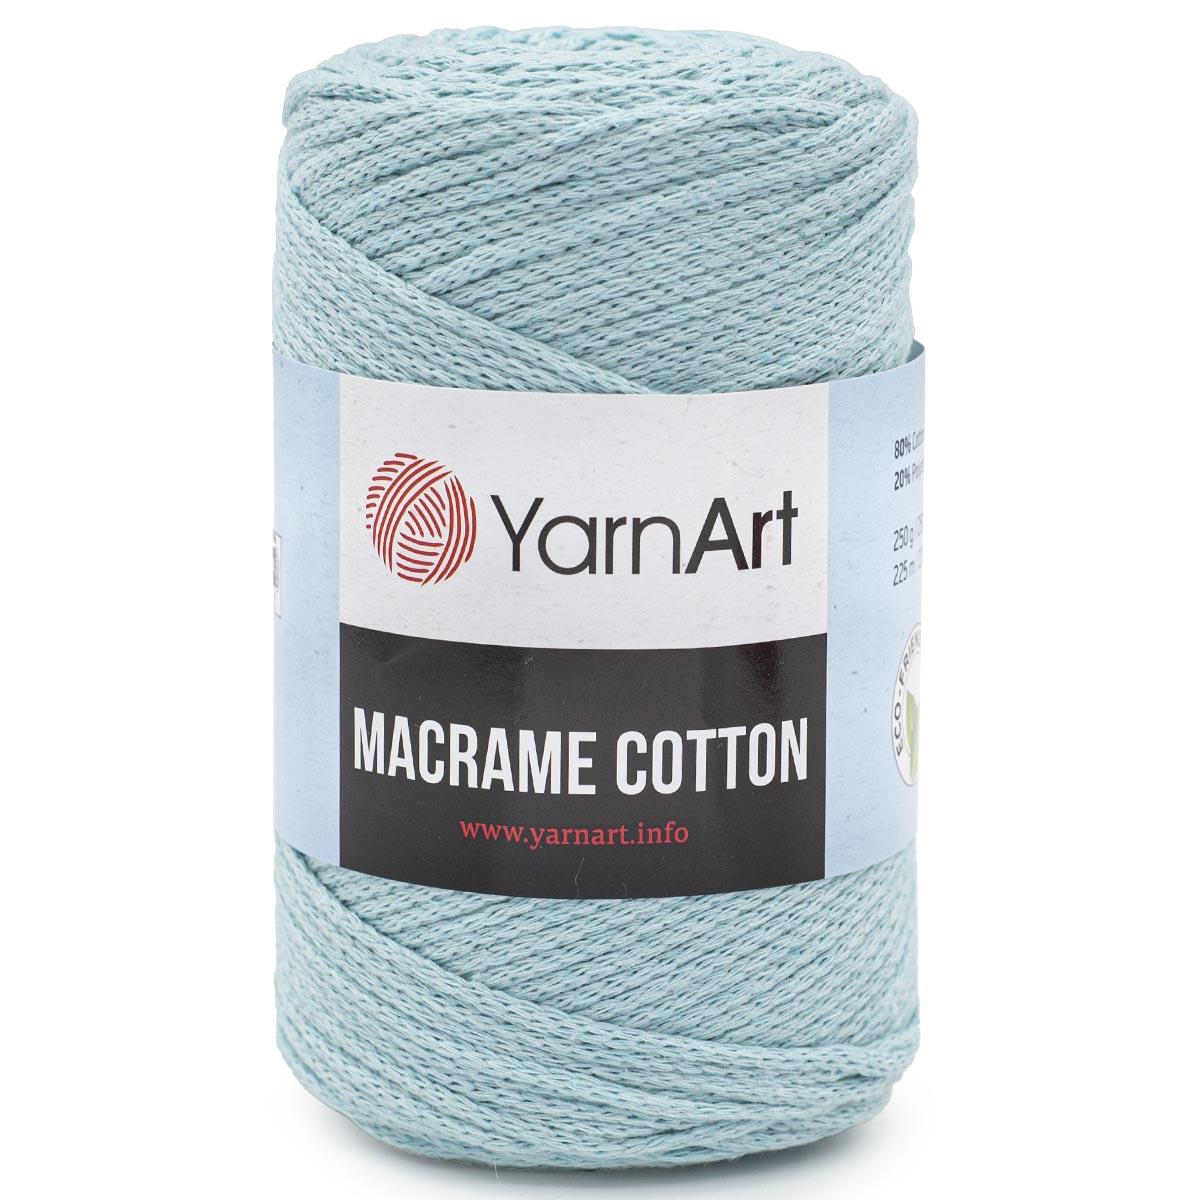 Пряжа YarnArt 'Macrame Cotton' 250гр 225м (80% хлопок, 20% полиэстер)